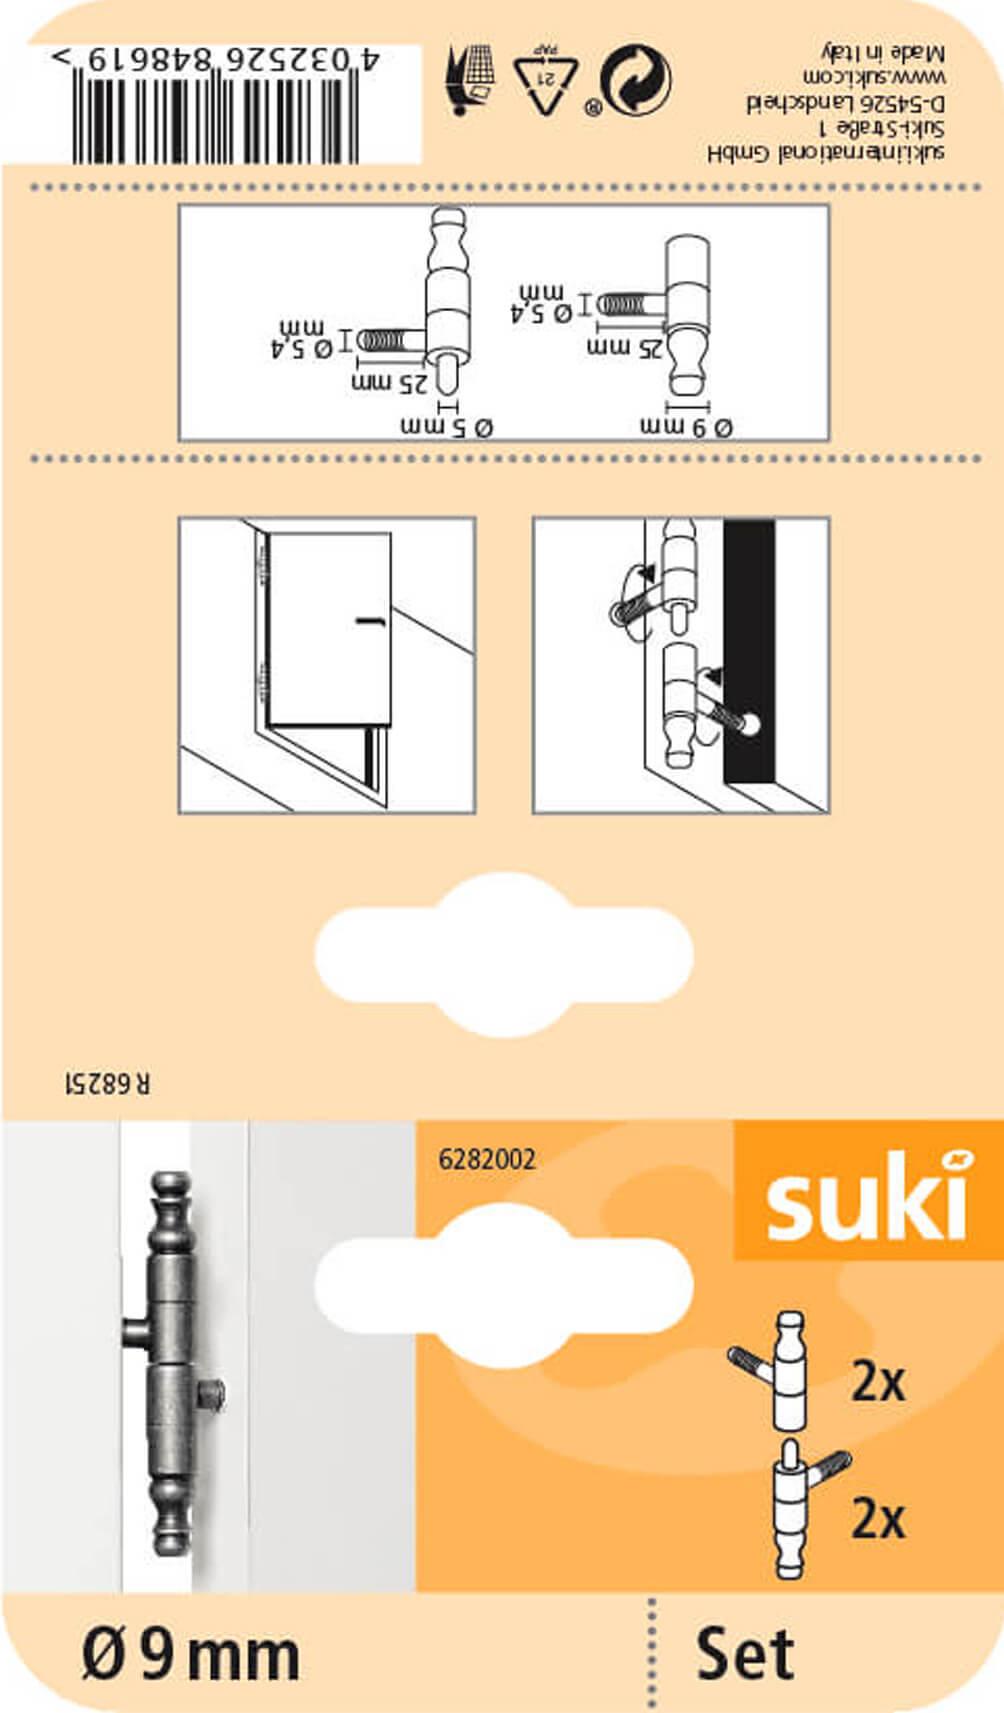 suki Messingb/ürste 4reihig 3x28 Holzgriff 3er-Set,Reinigungsb/ürste